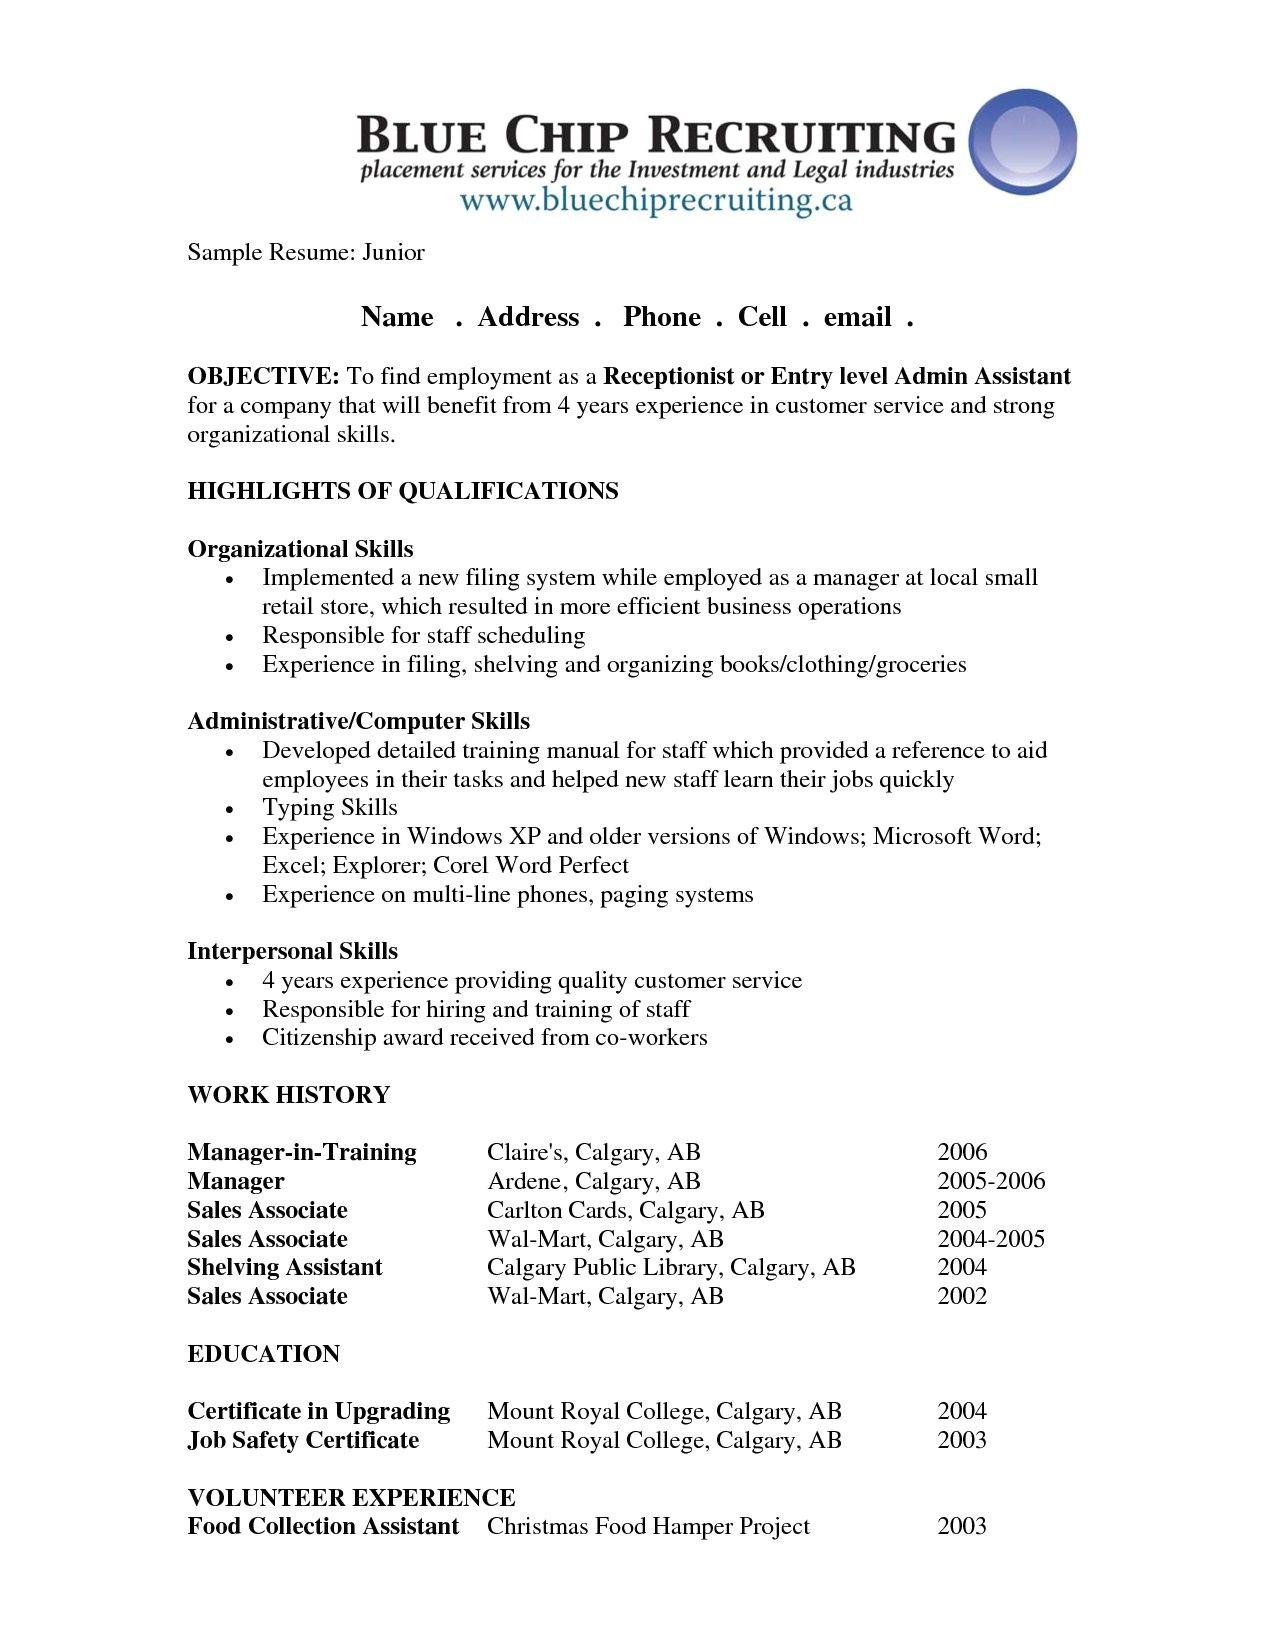 Sample Resume Objectives for Medical Receptionist Receptionist Resume Objective Sample Http